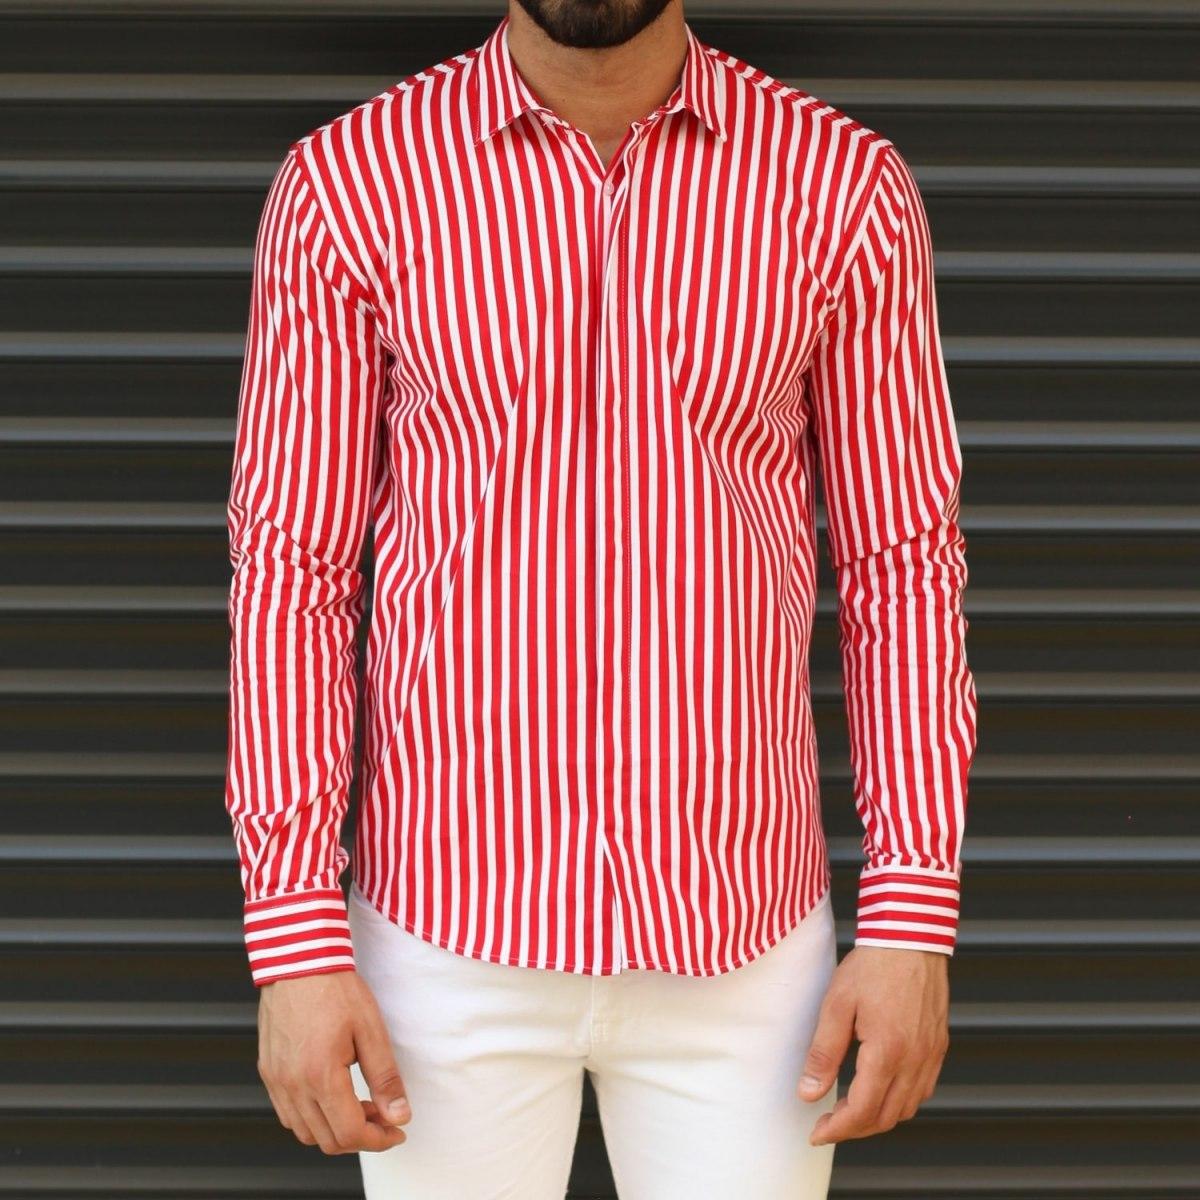 Men's Striped Slim Fit Casual Shirt In Red Mv Premium Brand - 1